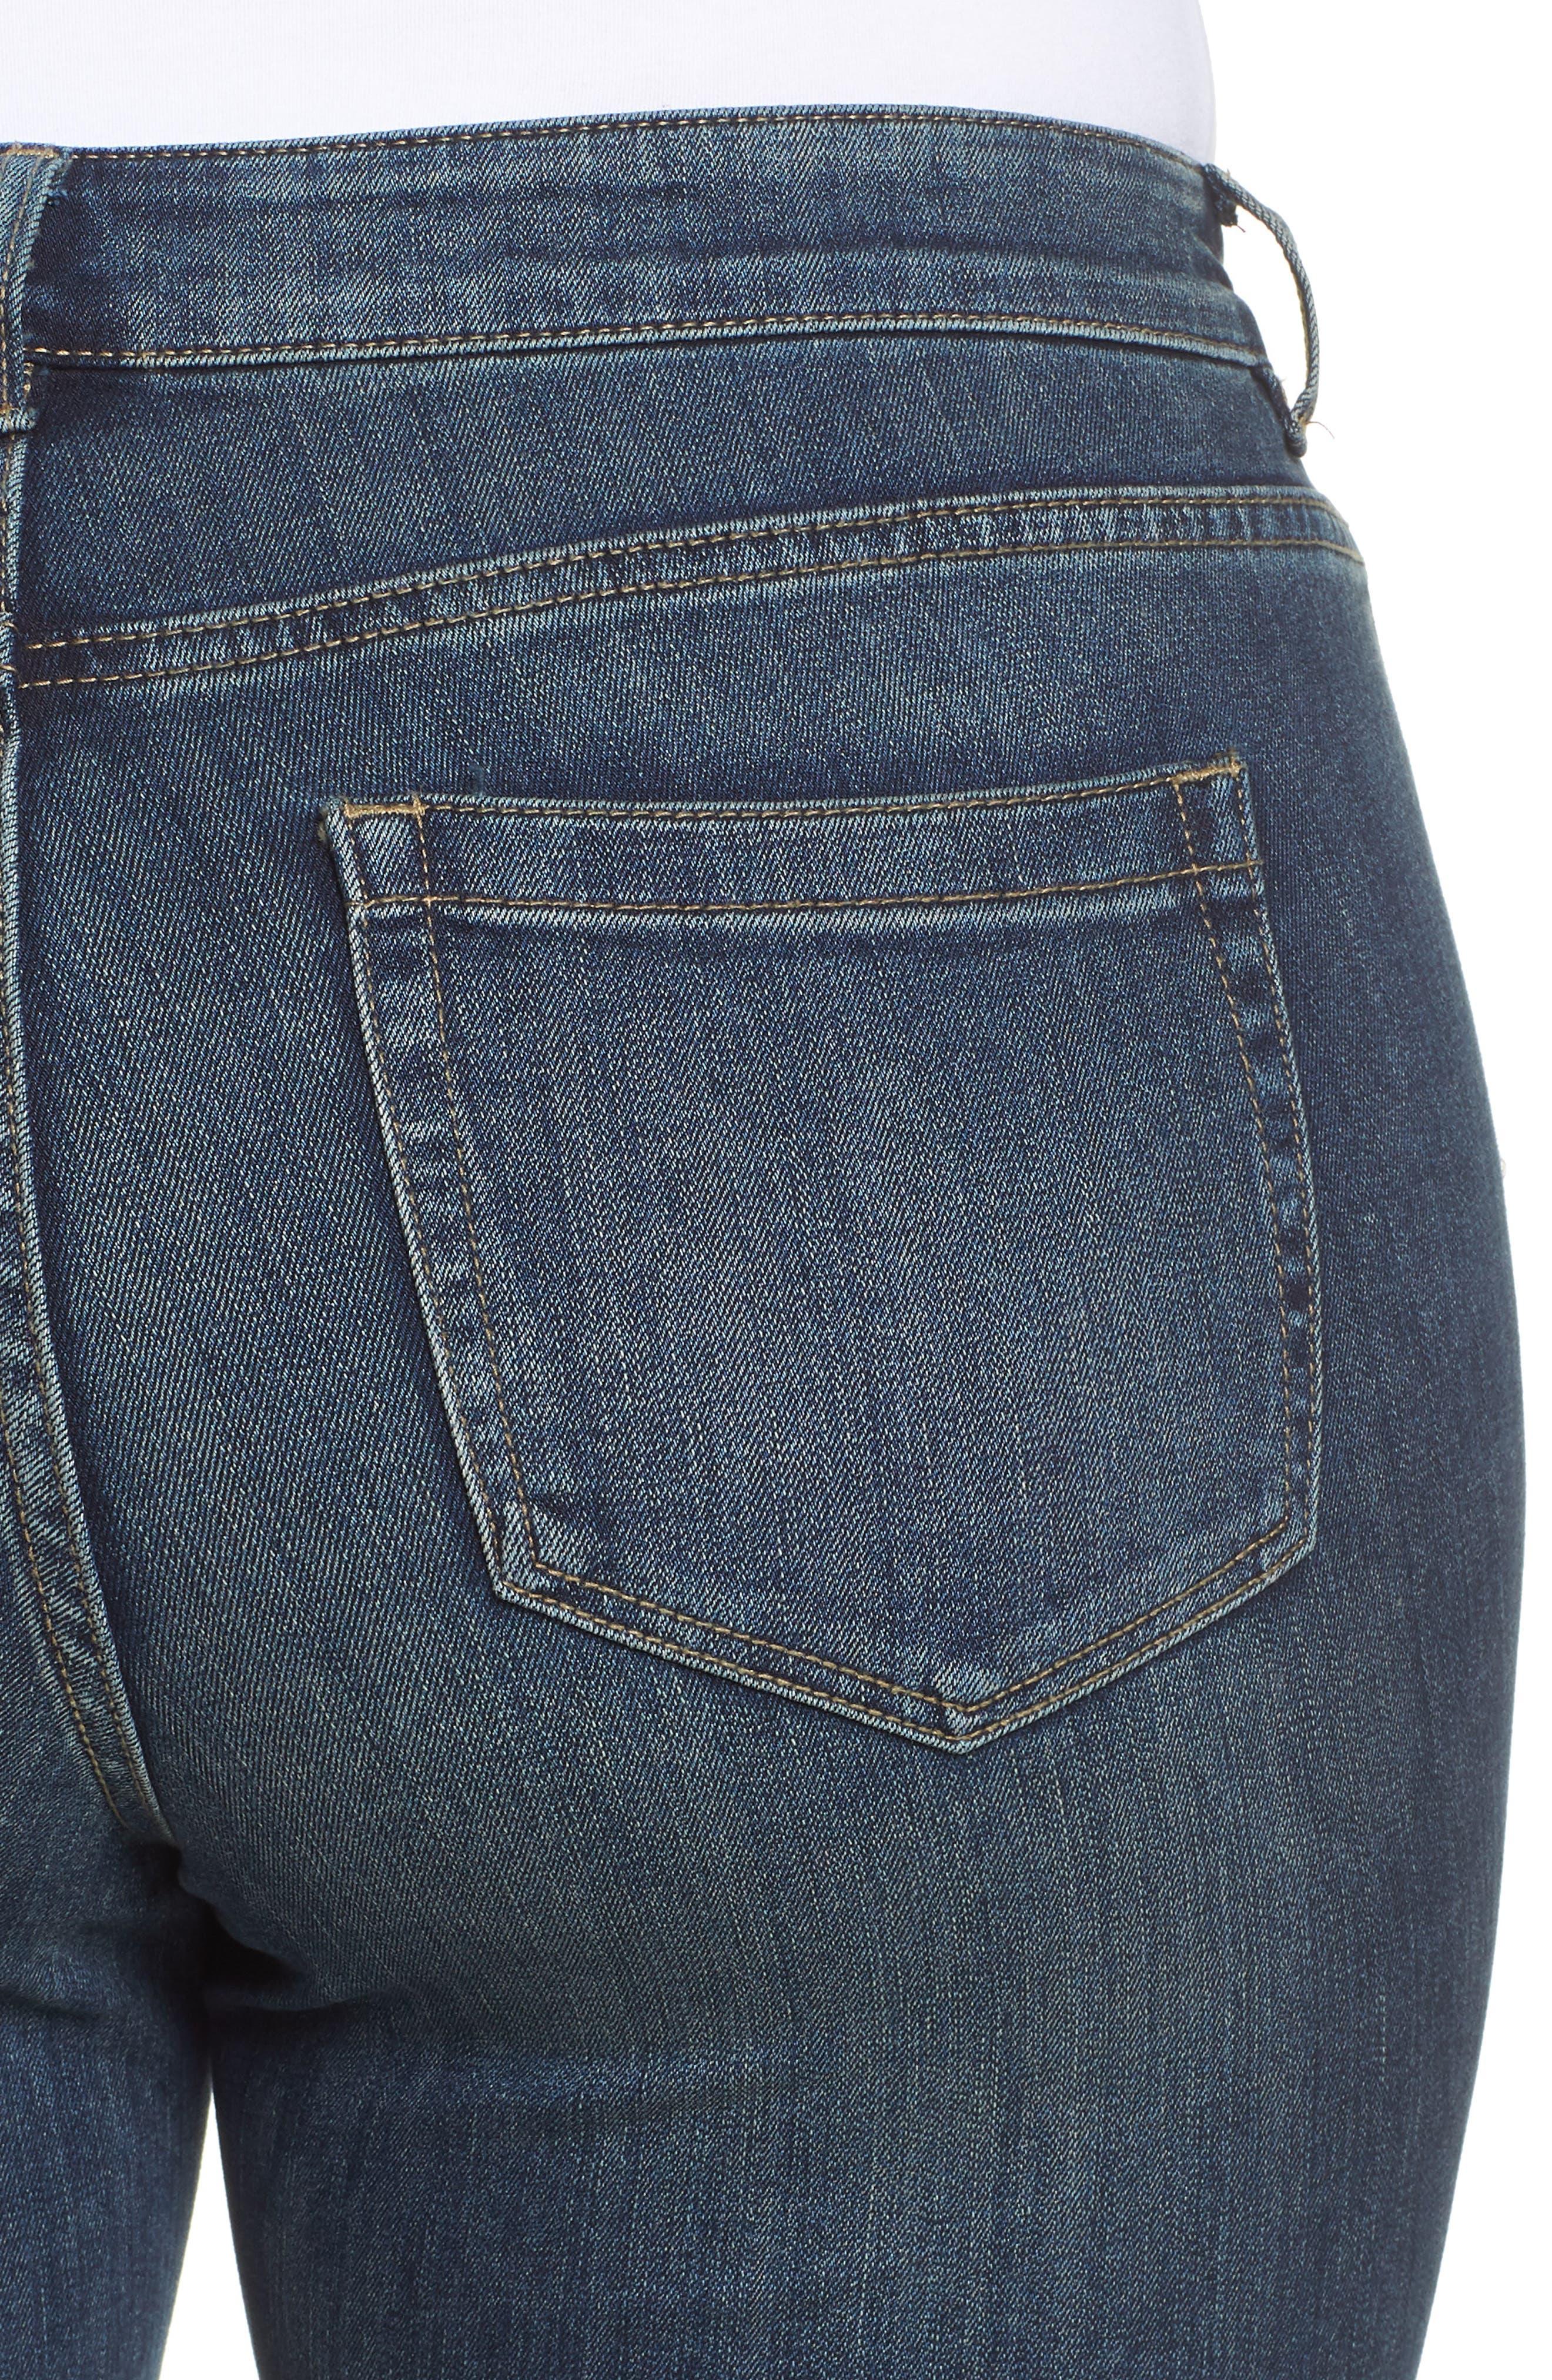 Release Hem Ankle Jeans,                             Alternate thumbnail 4, color,                             Mid Vintage